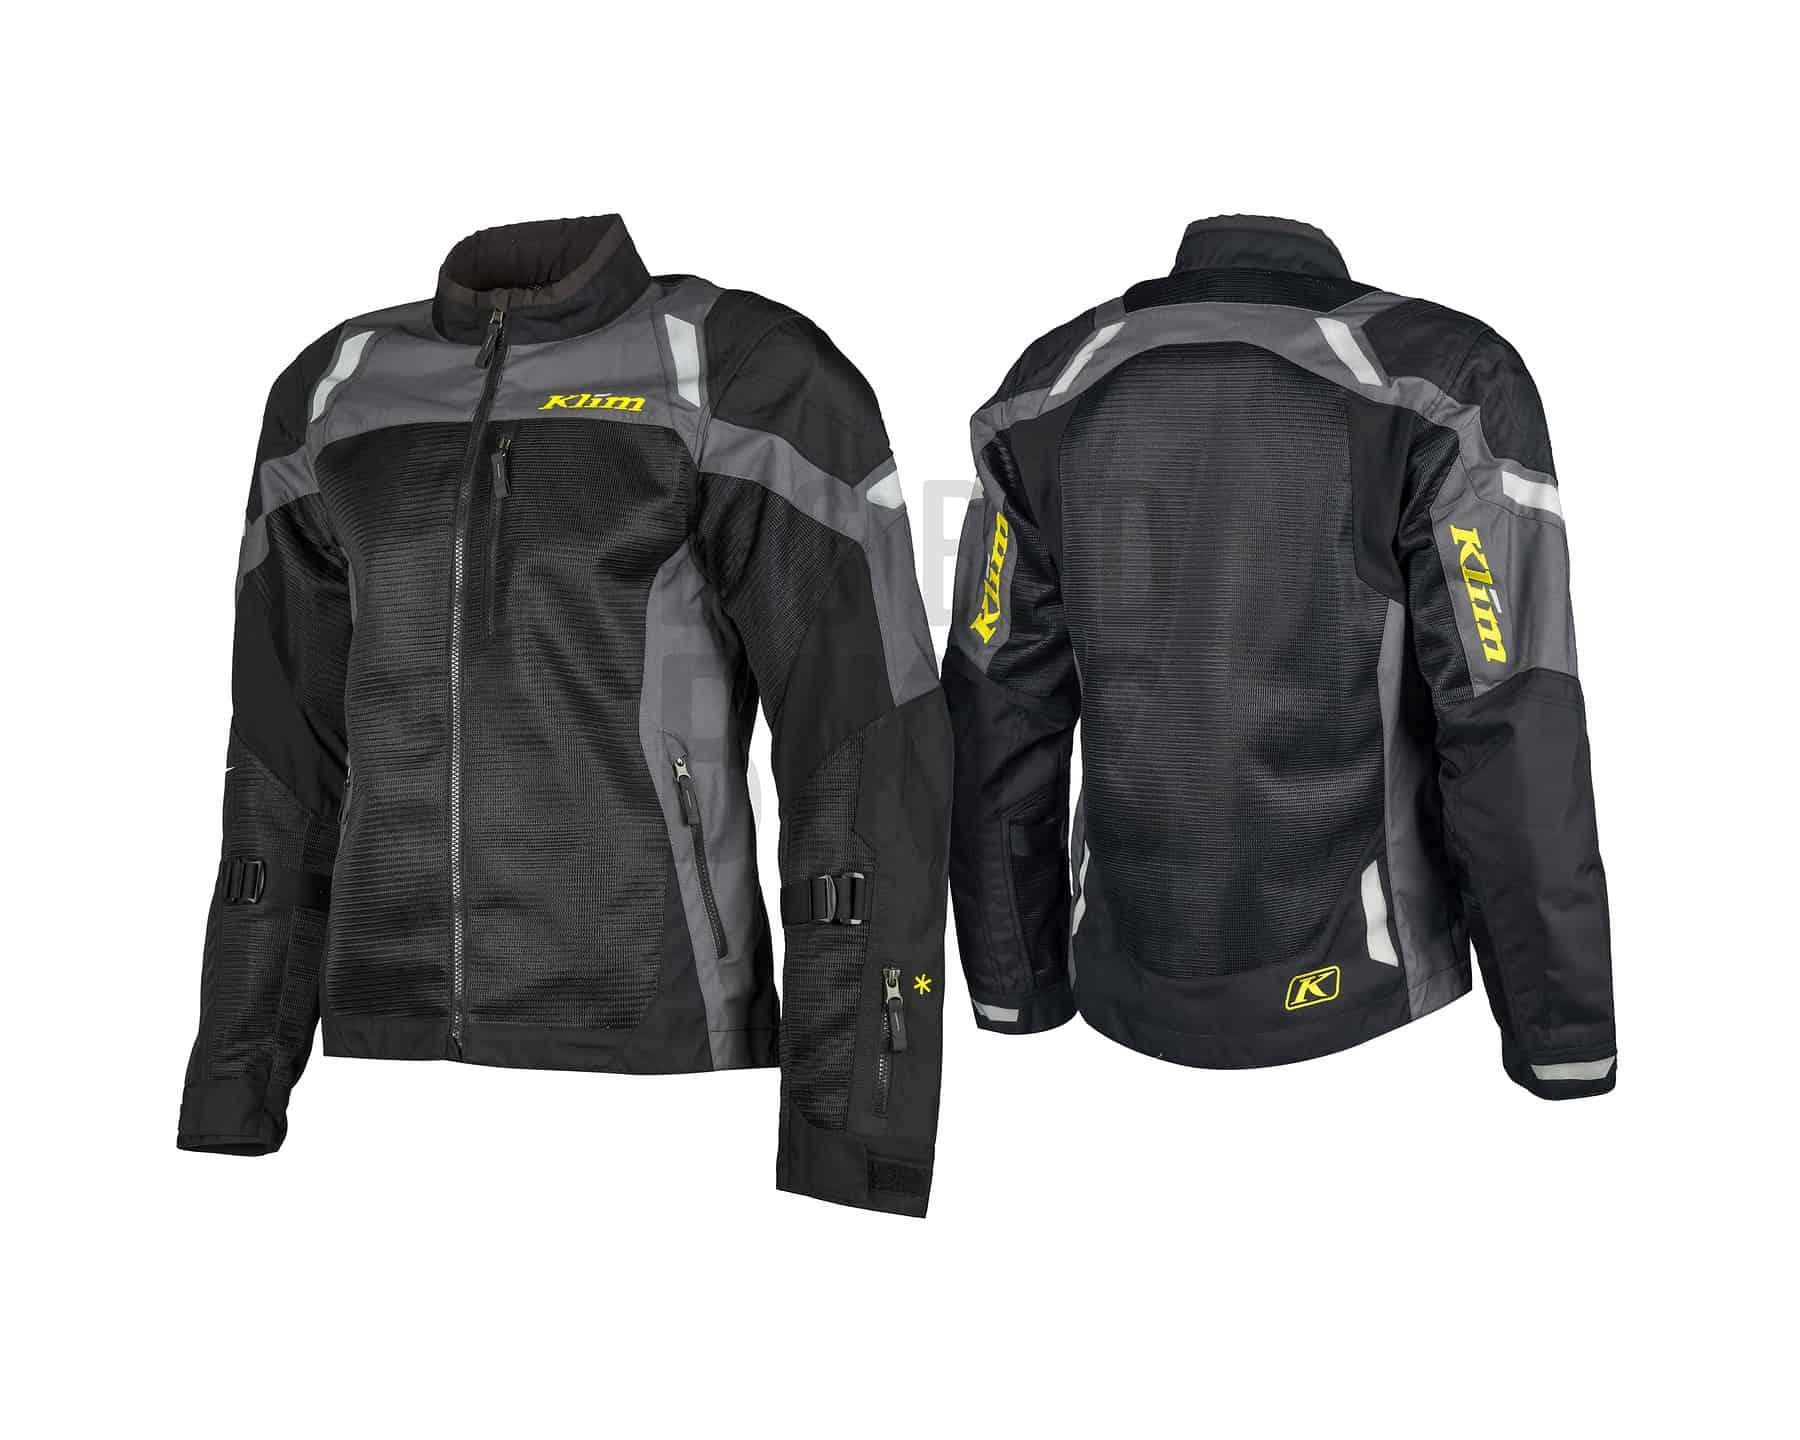 Induction Jacket_5060-002_Dark Gray_Decondary_02